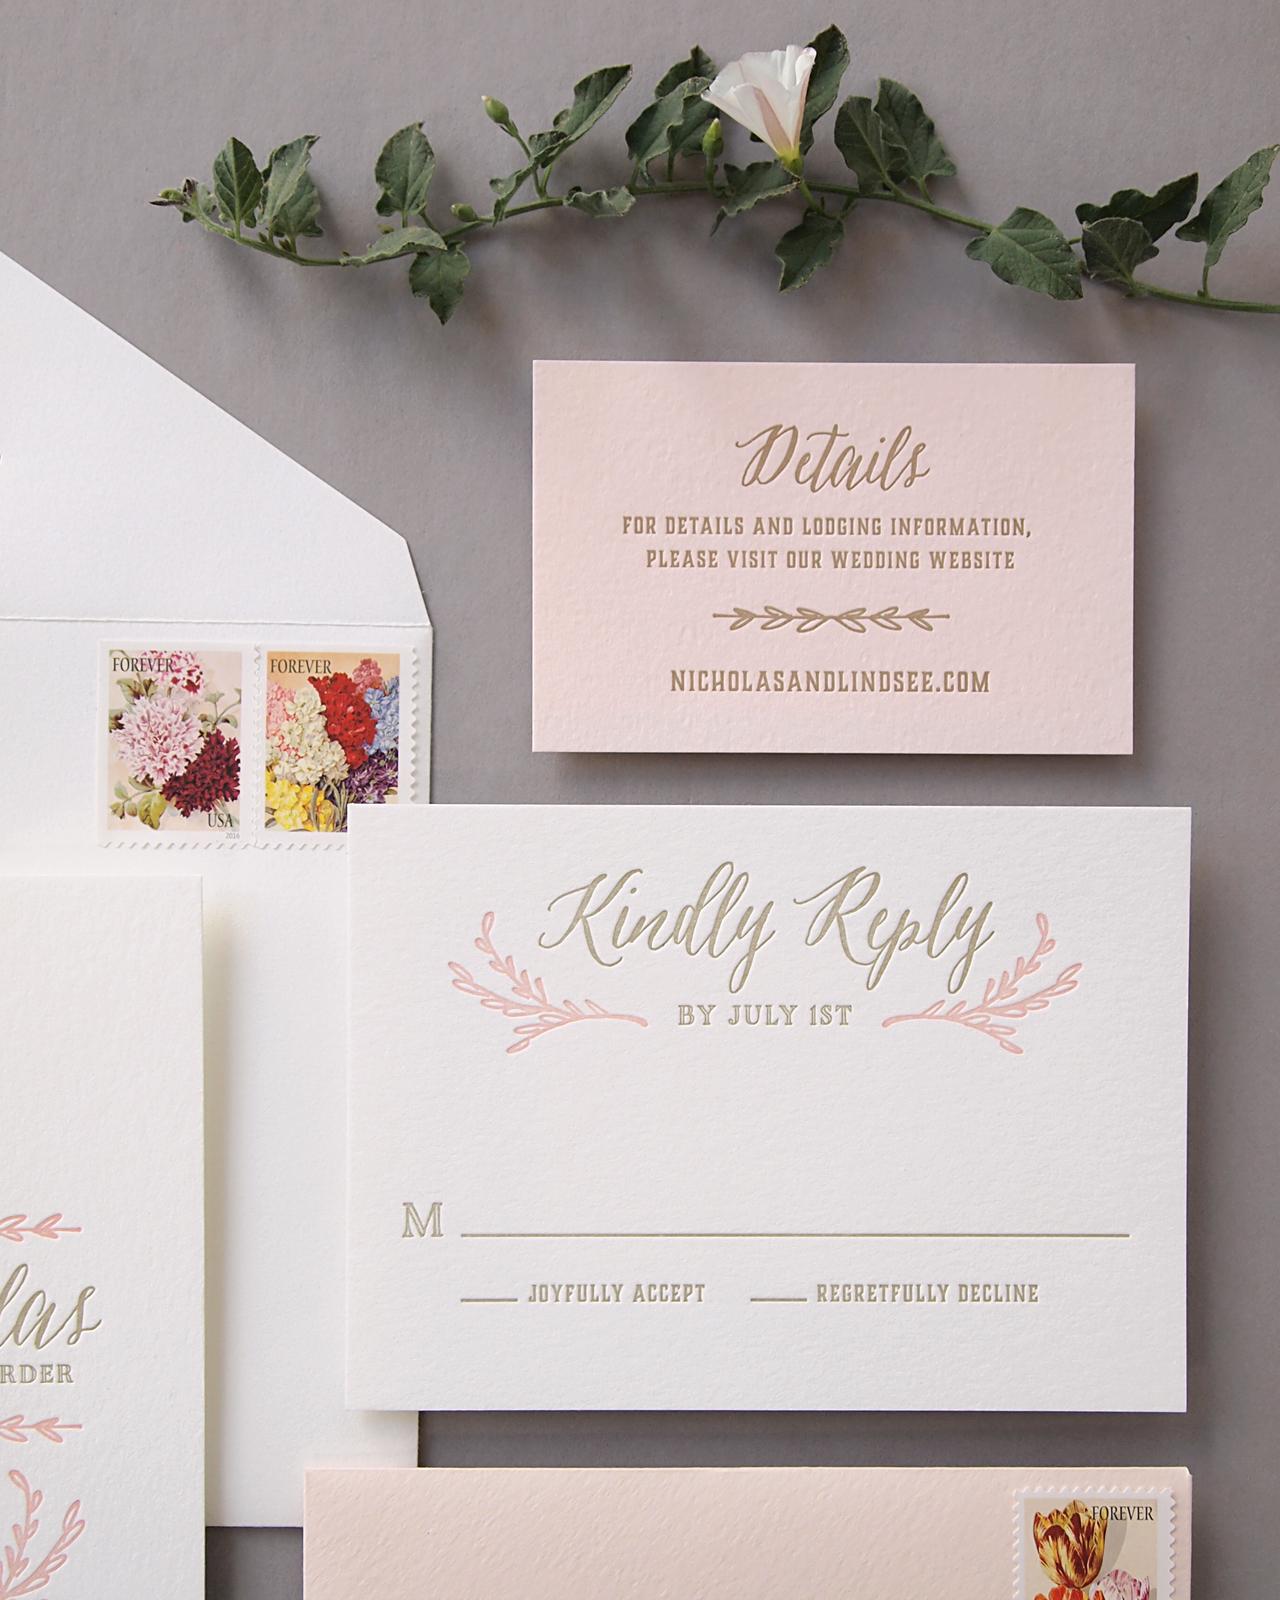 elegant blush and gold letterpress wedding invitations blush wedding invitations Elegant Blush and Gold Letterpress Wedding Invitations by Missive